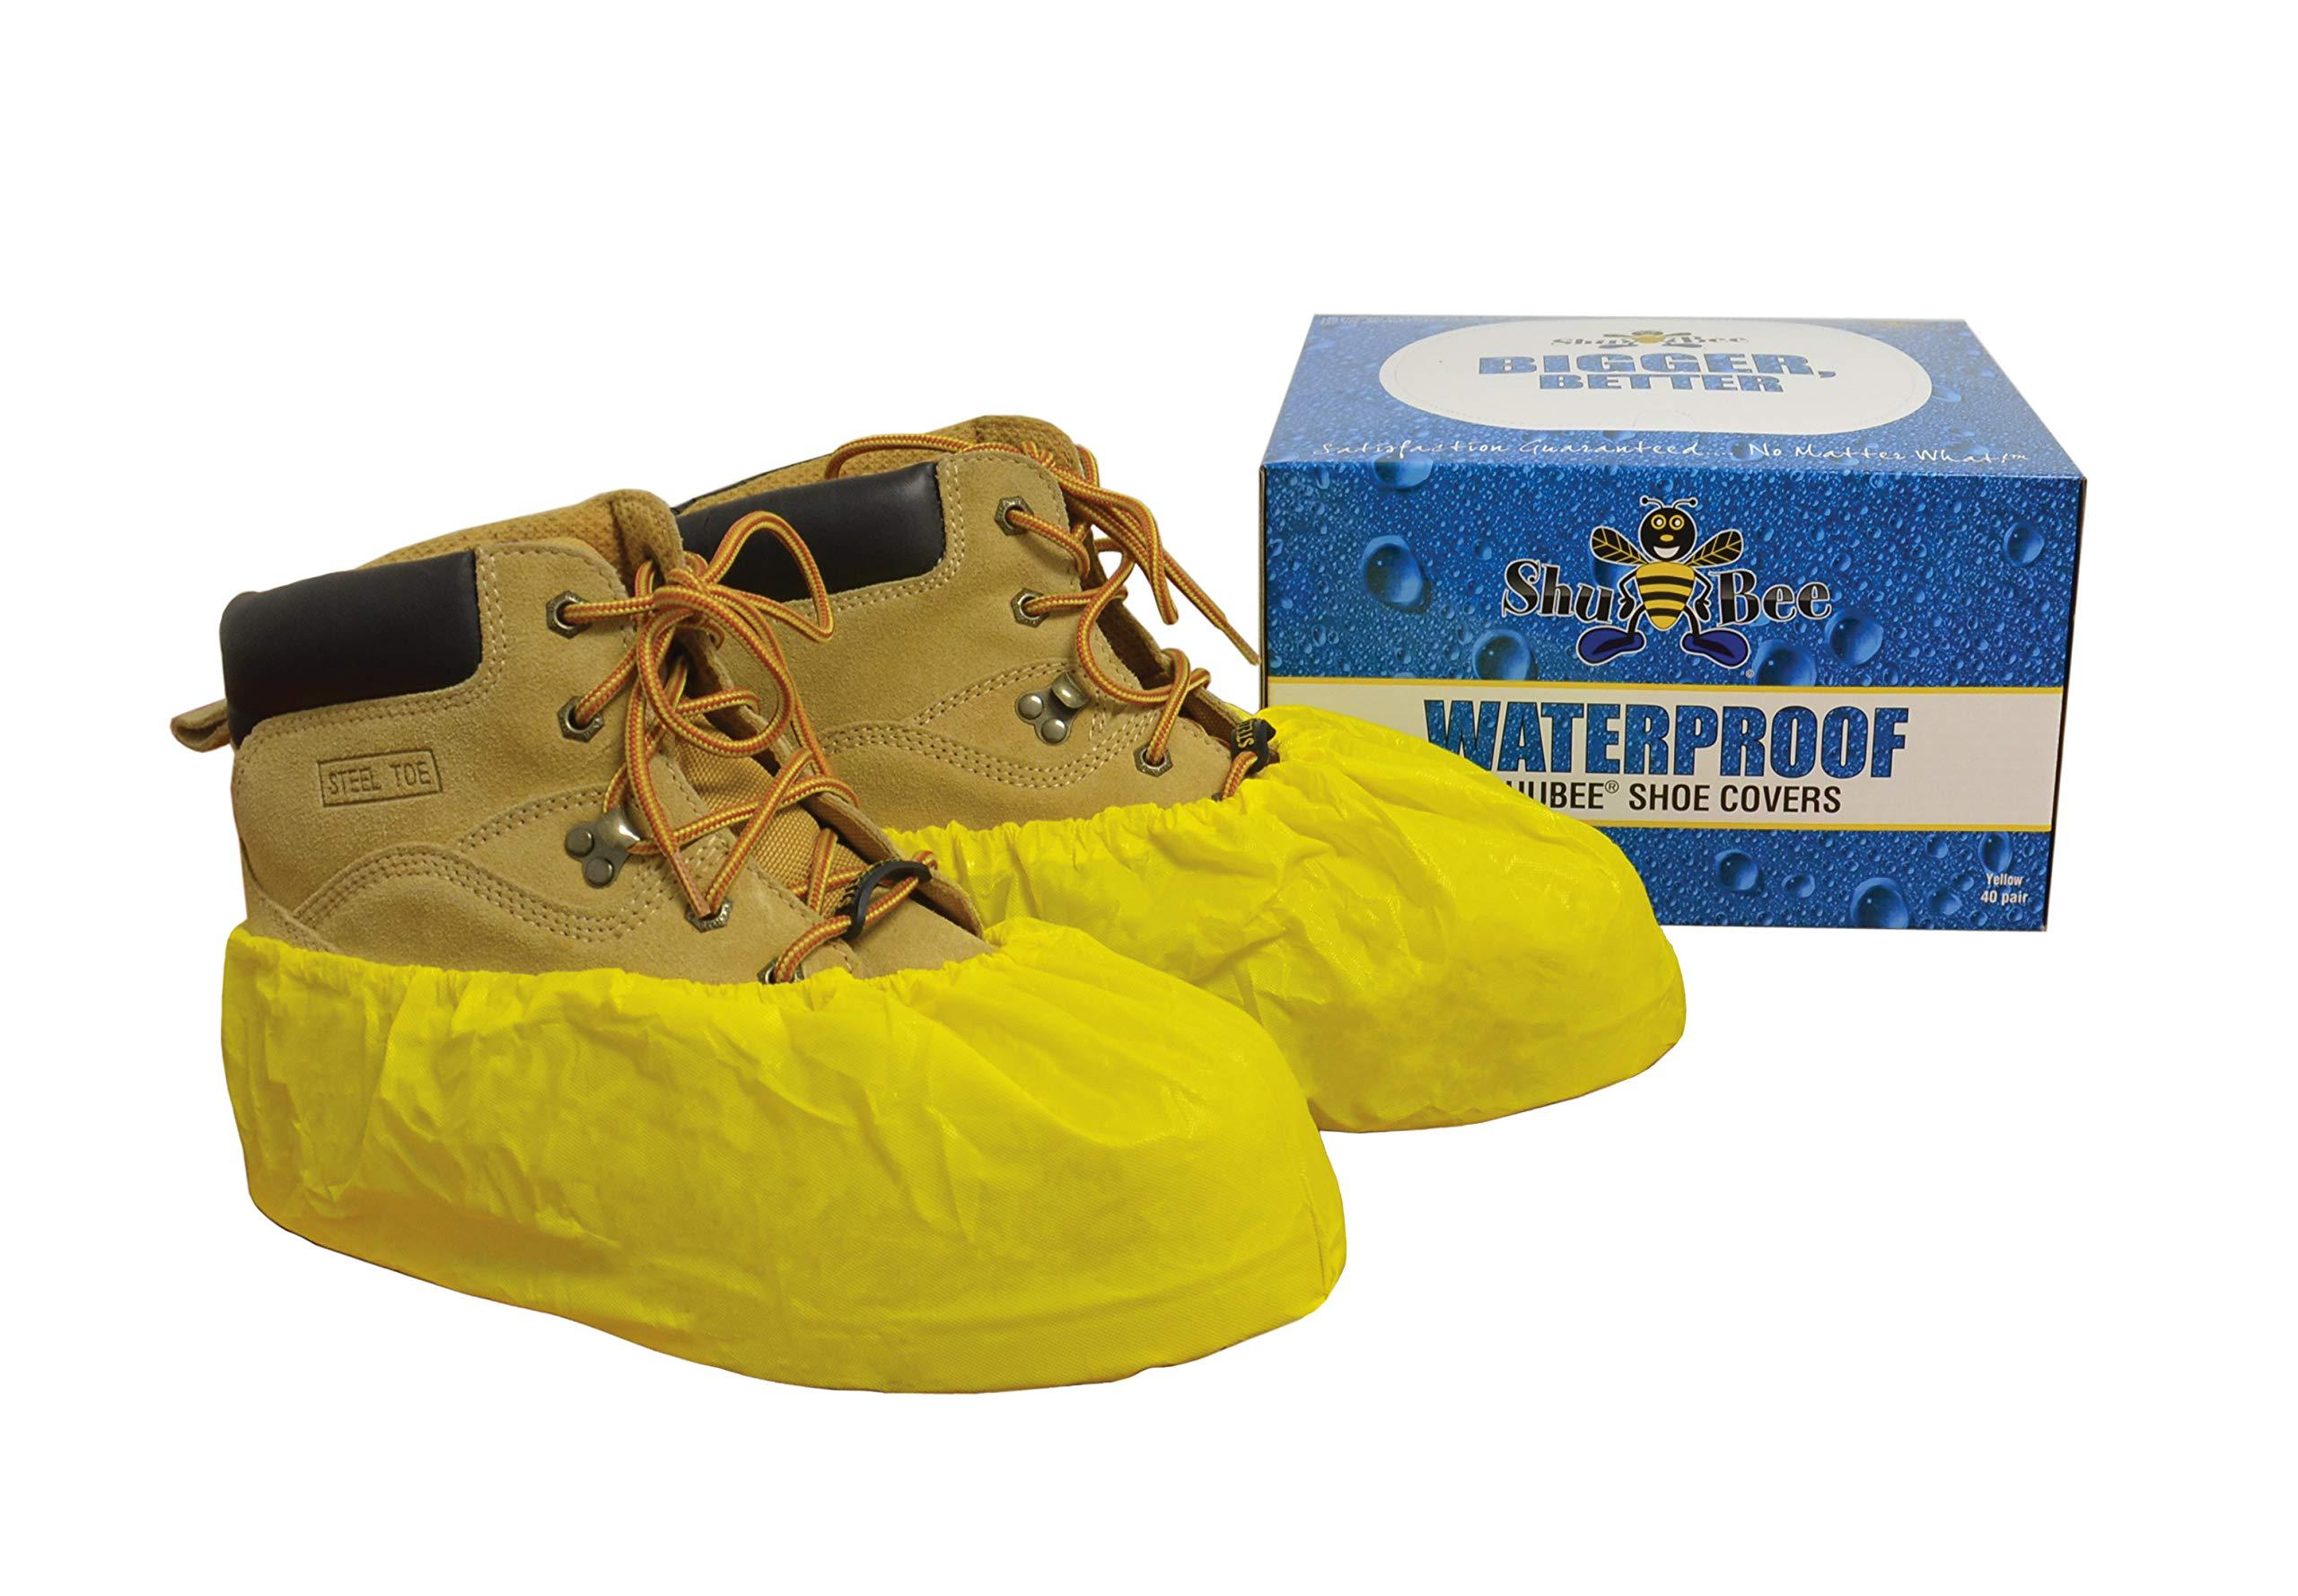 ShuBee Waterproof Shoe Covers, Yellow (40 Pair) by ShuBee